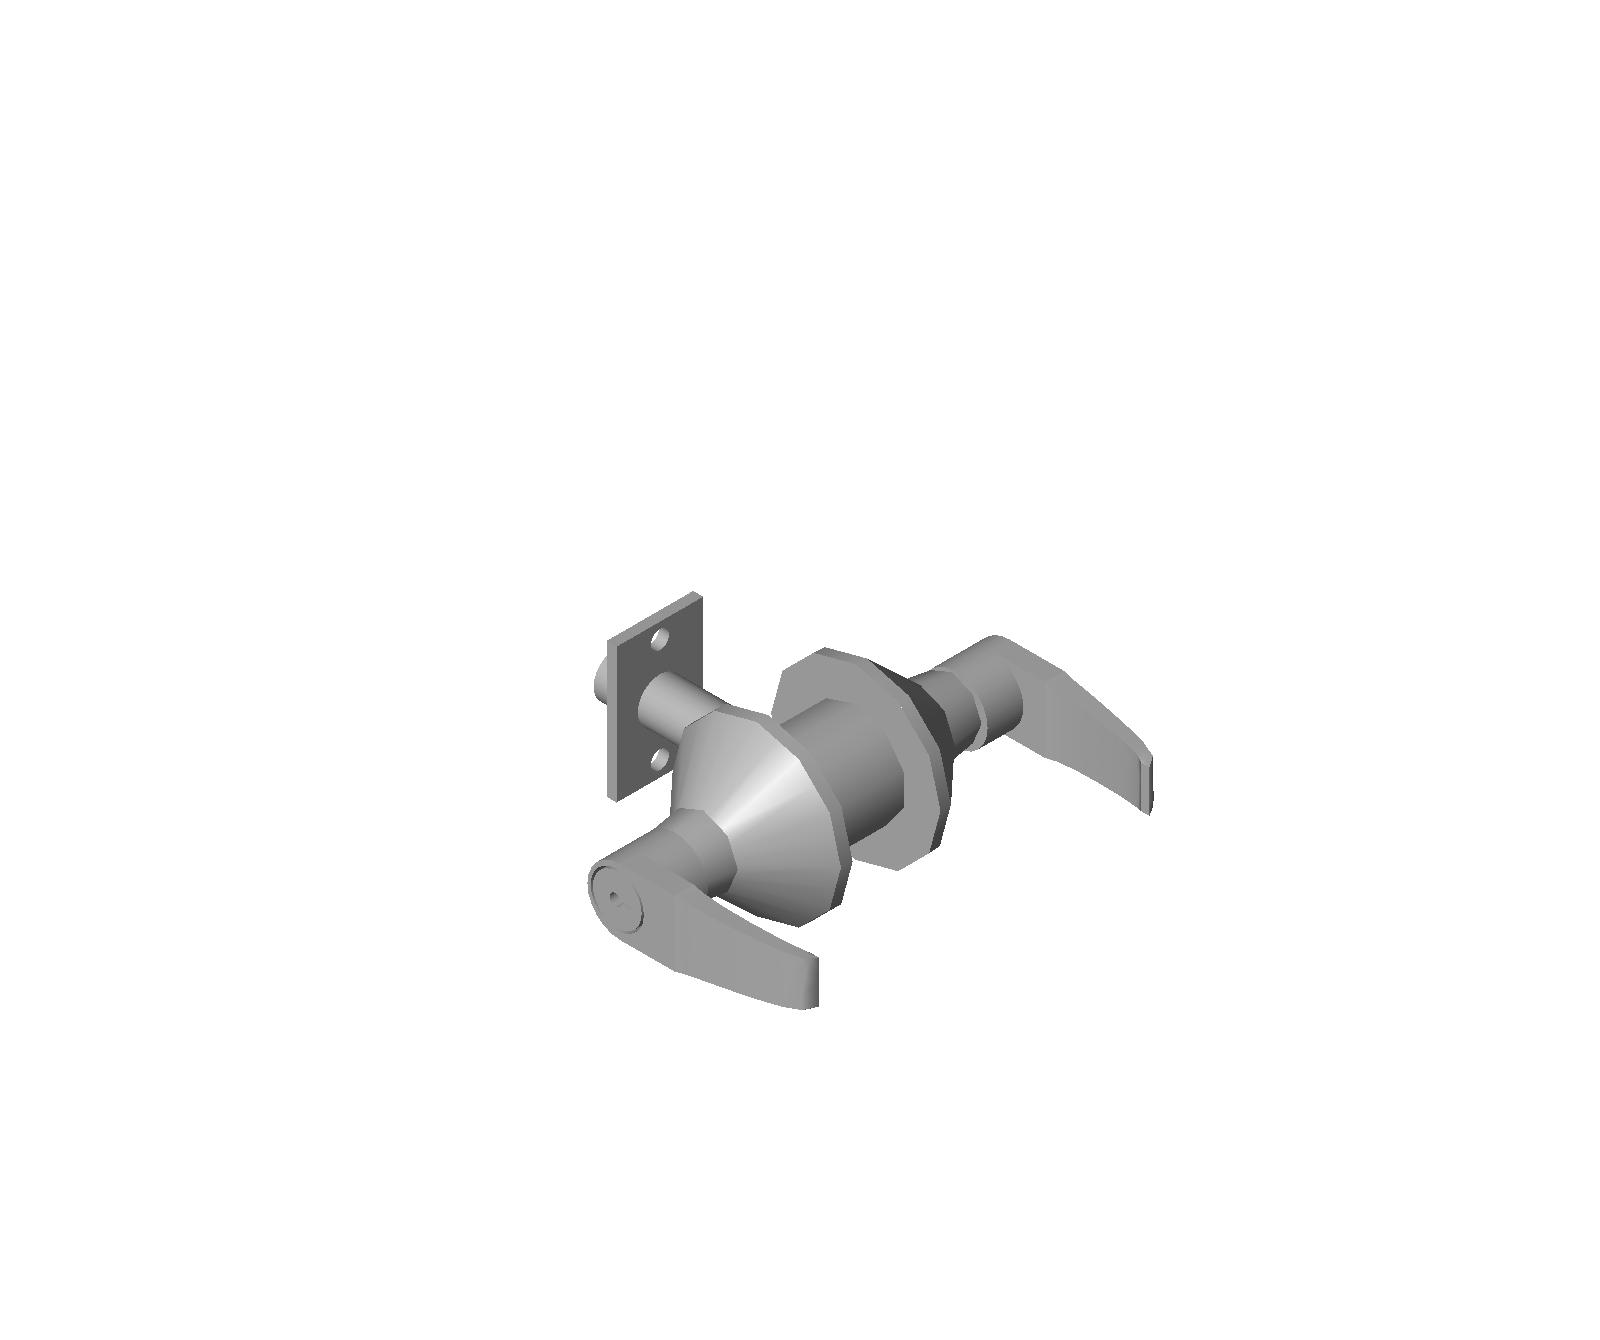 Doors and Hardware Door Hardware Locksets - Cylindrical Grade2 - PDQ - GP Series - MIA (PDQ Mfg.)  sc 1 st  Arcat & BIM Objects / Families